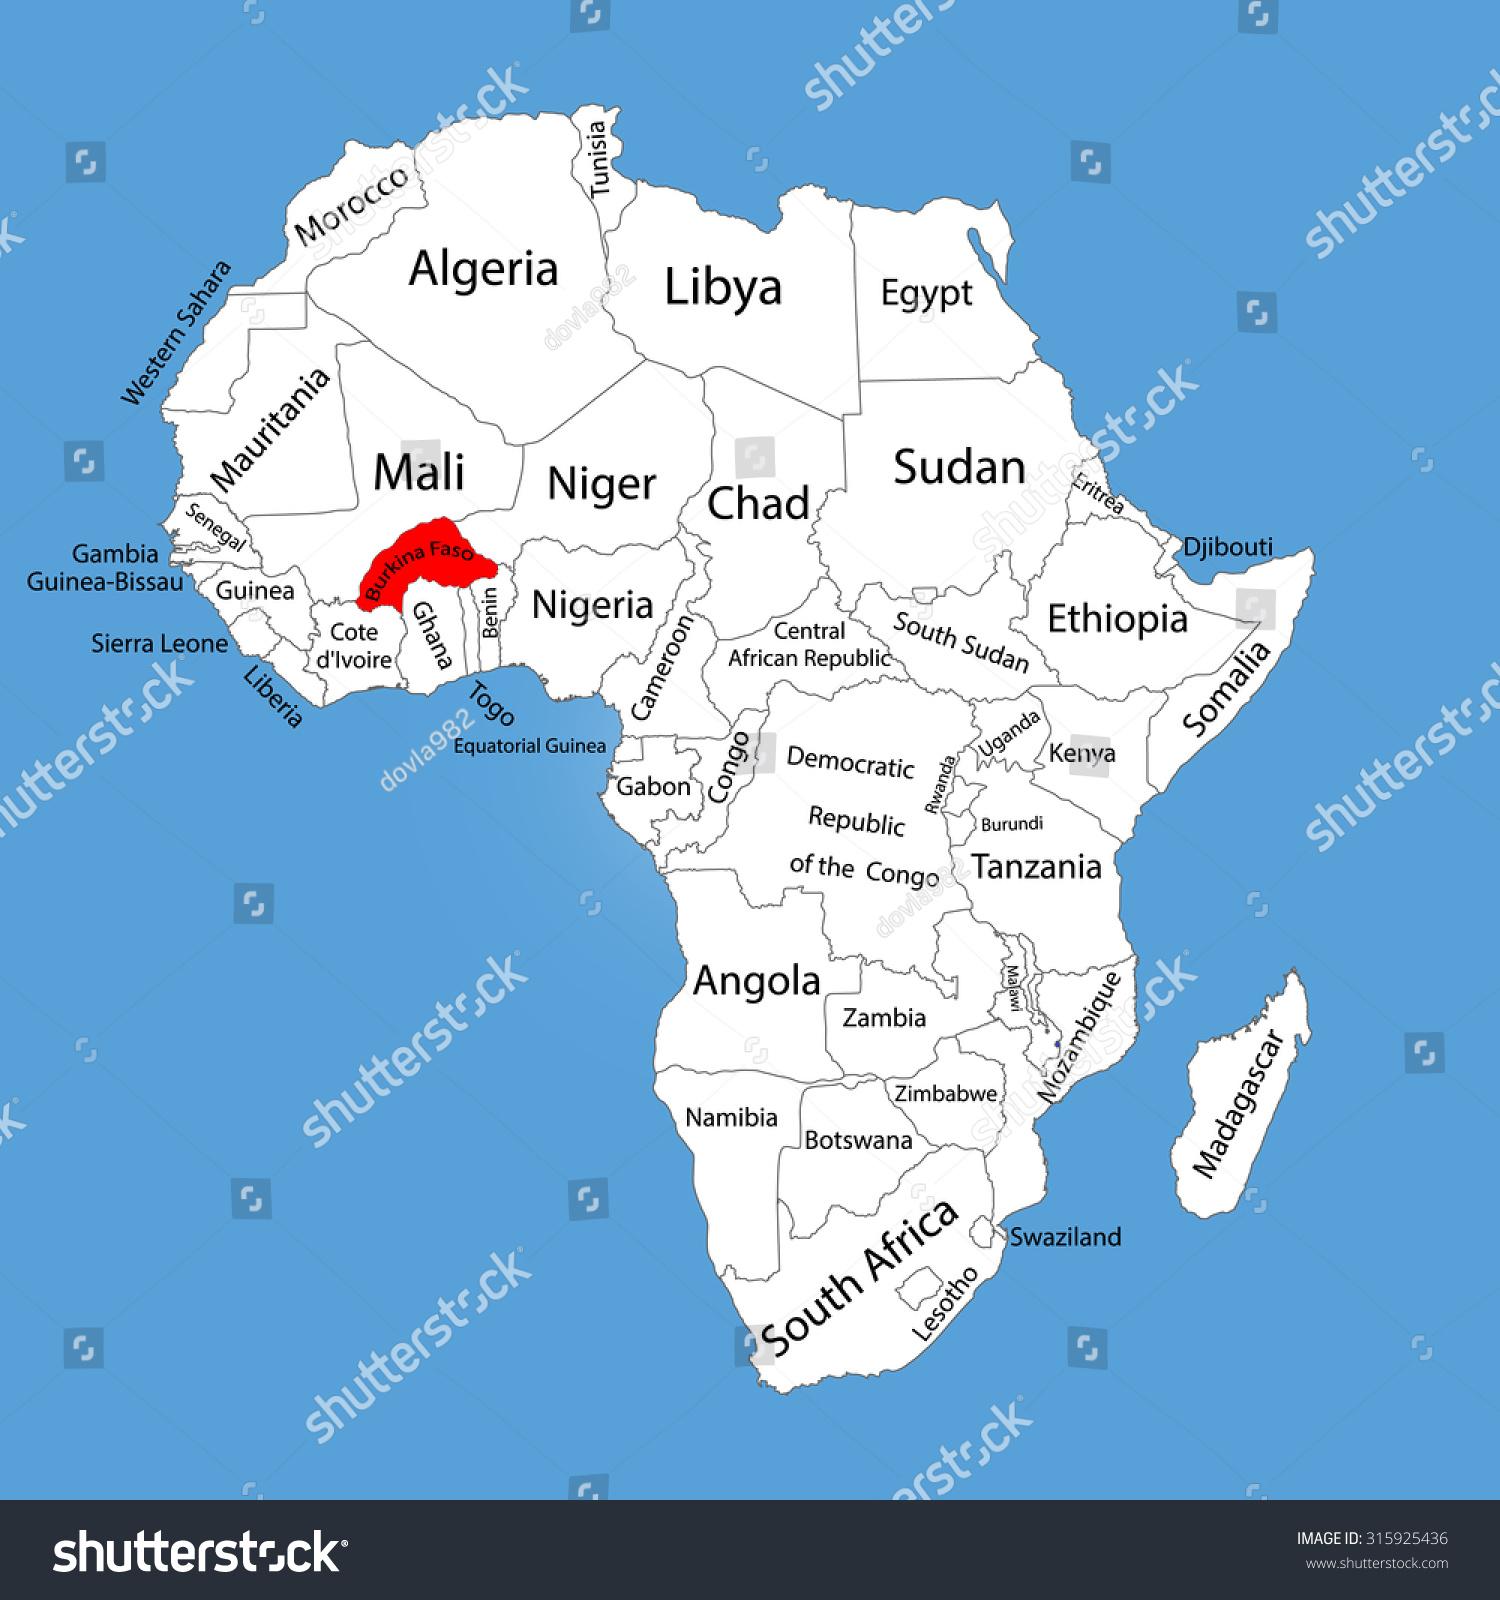 Burkina Faso Vector Map Silhouette Isolated Stock Vector - Burkina faso map